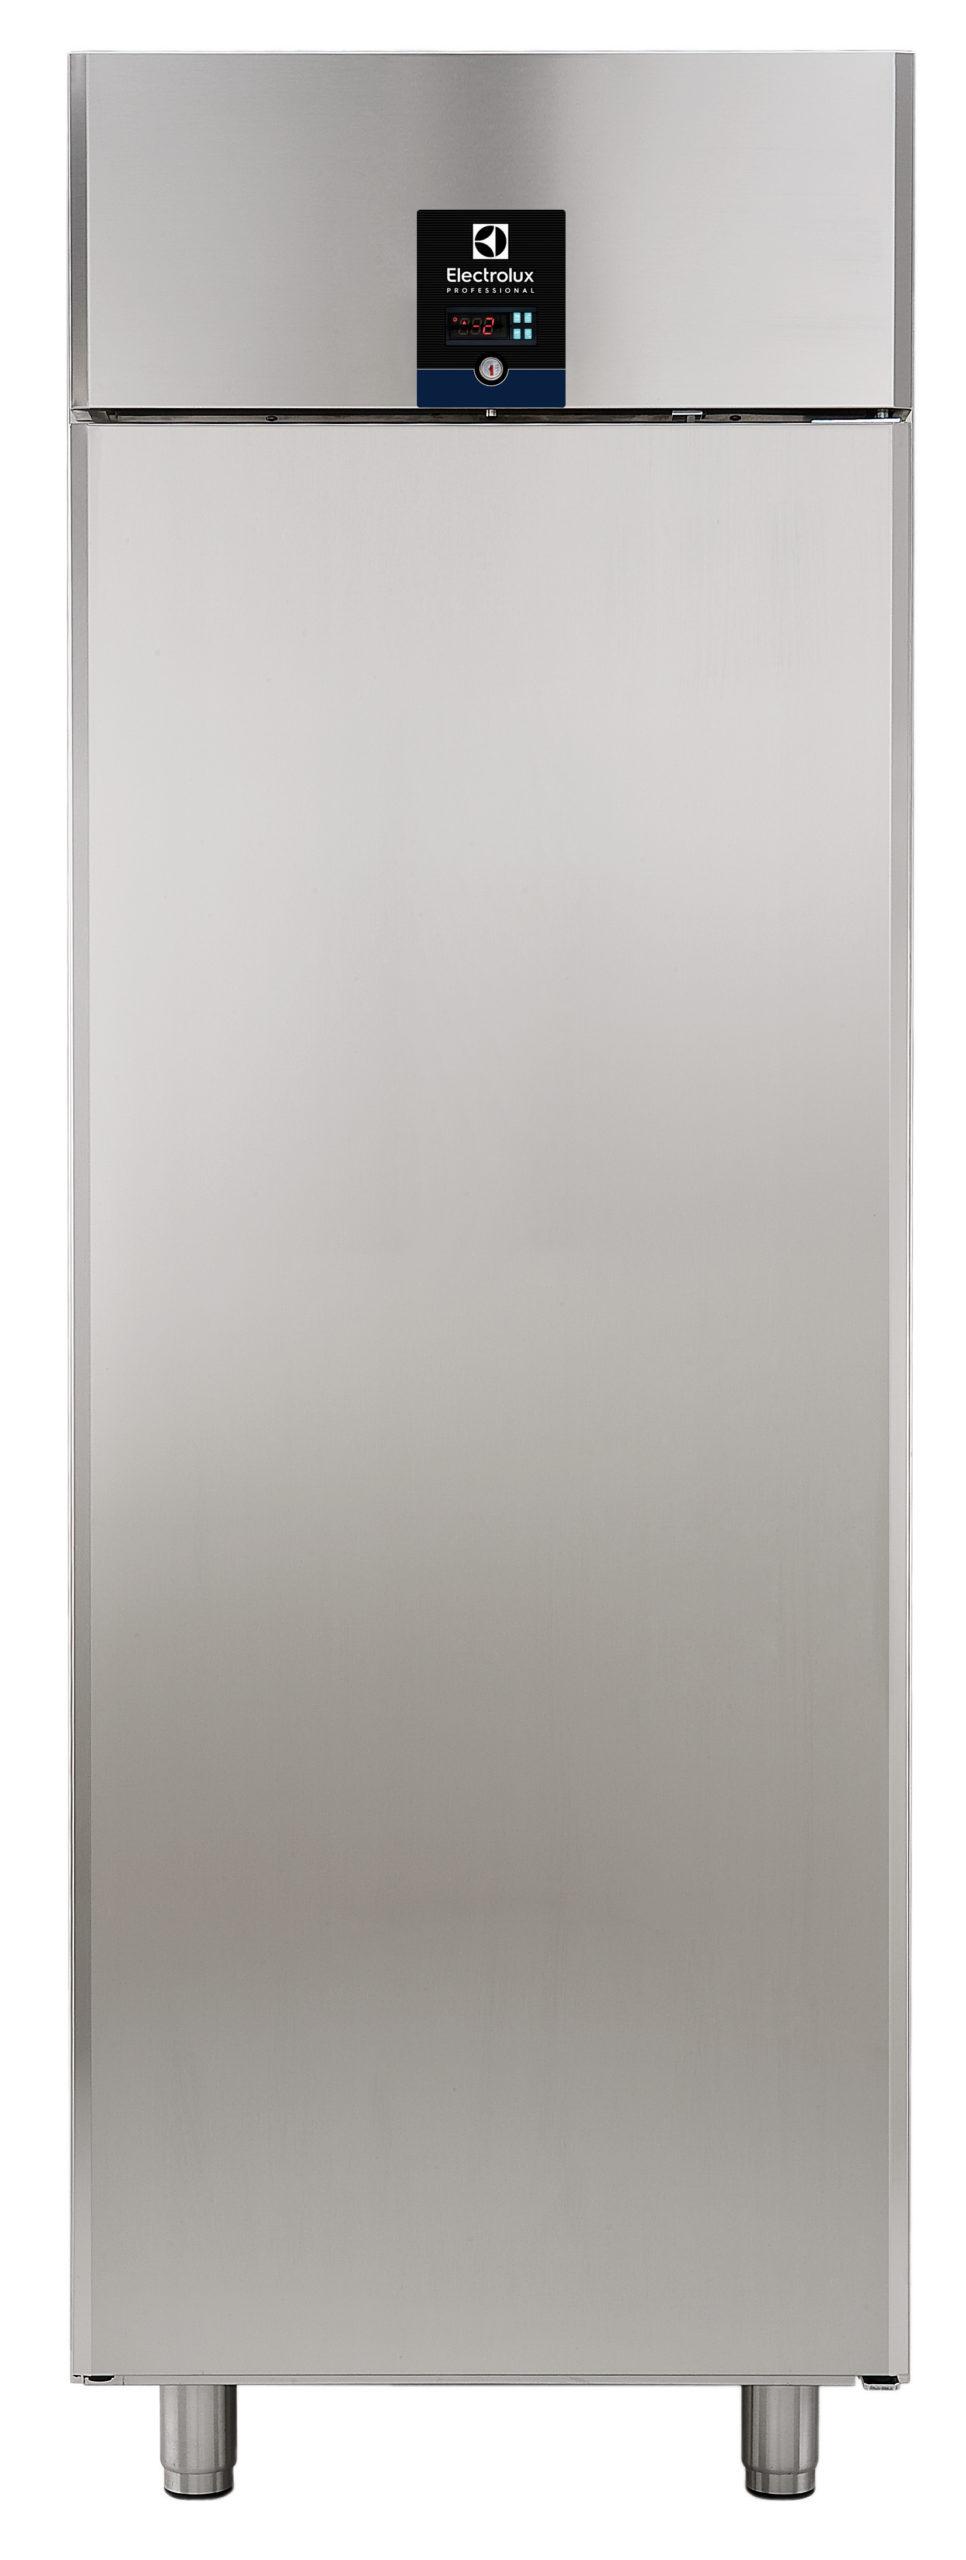 Electrolux ecostore køleskabe – R290